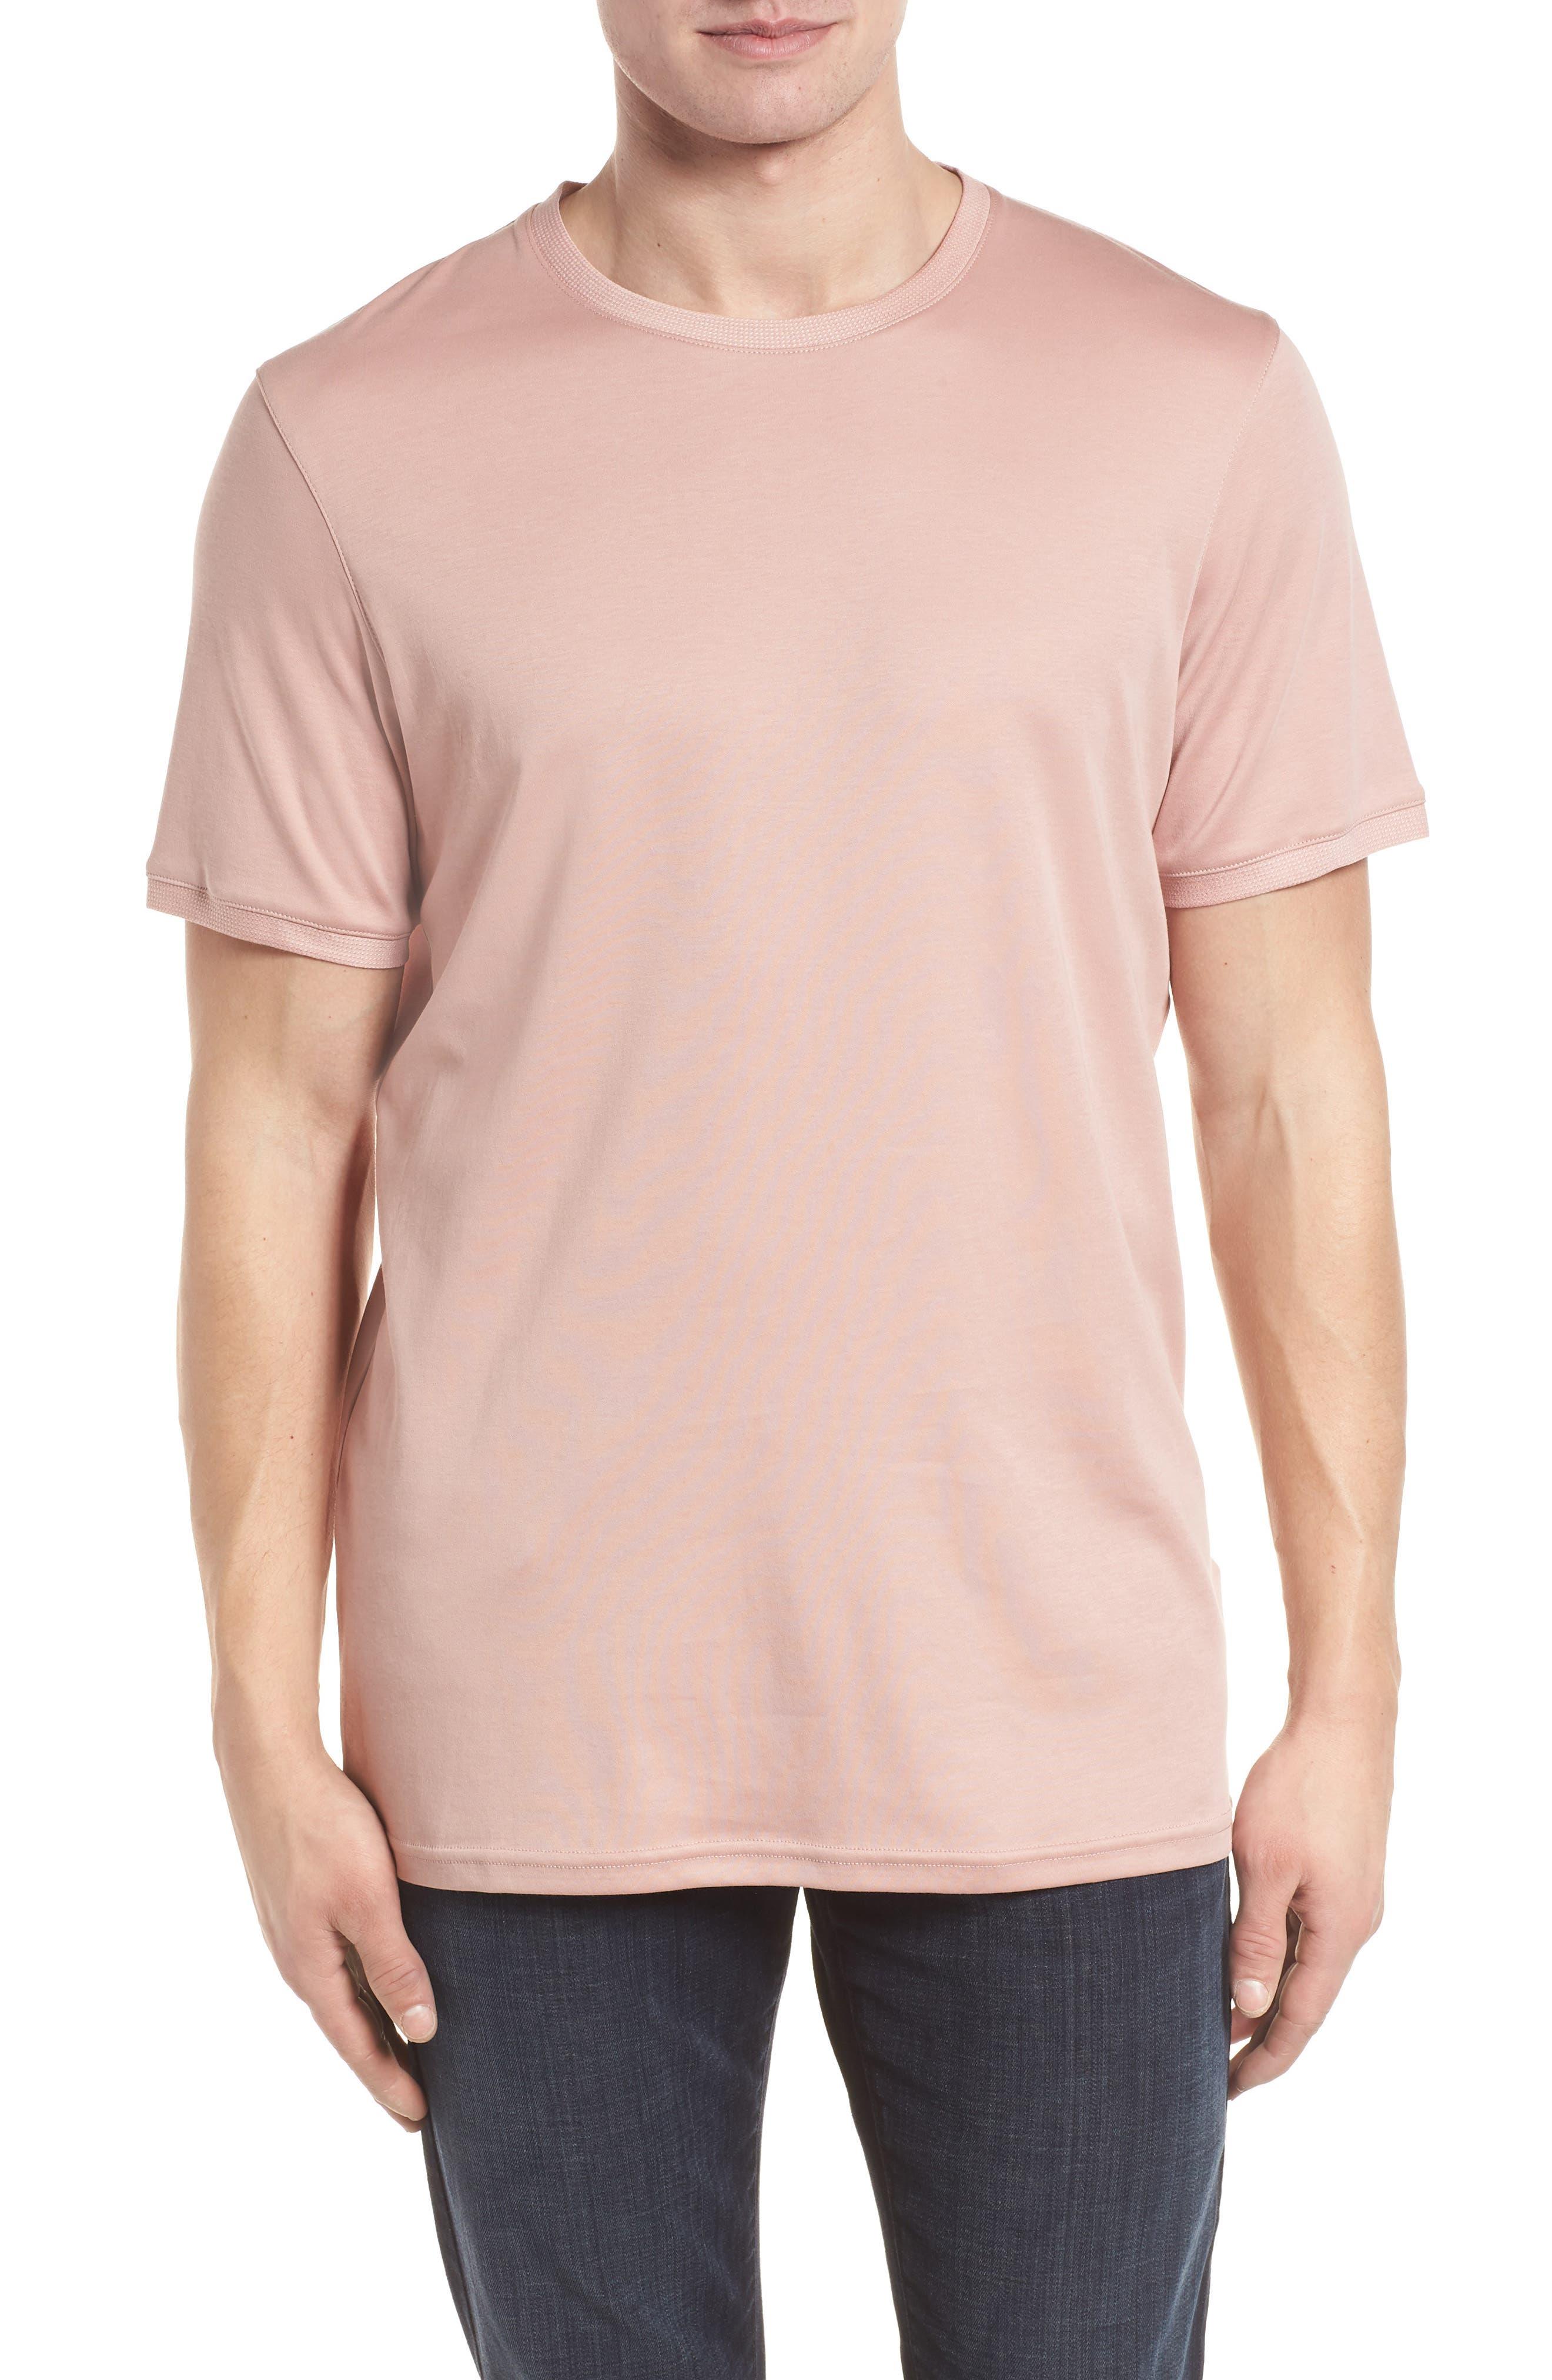 Piktt Crewneck T-Shirt,                             Main thumbnail 1, color,                             Dusky Pink